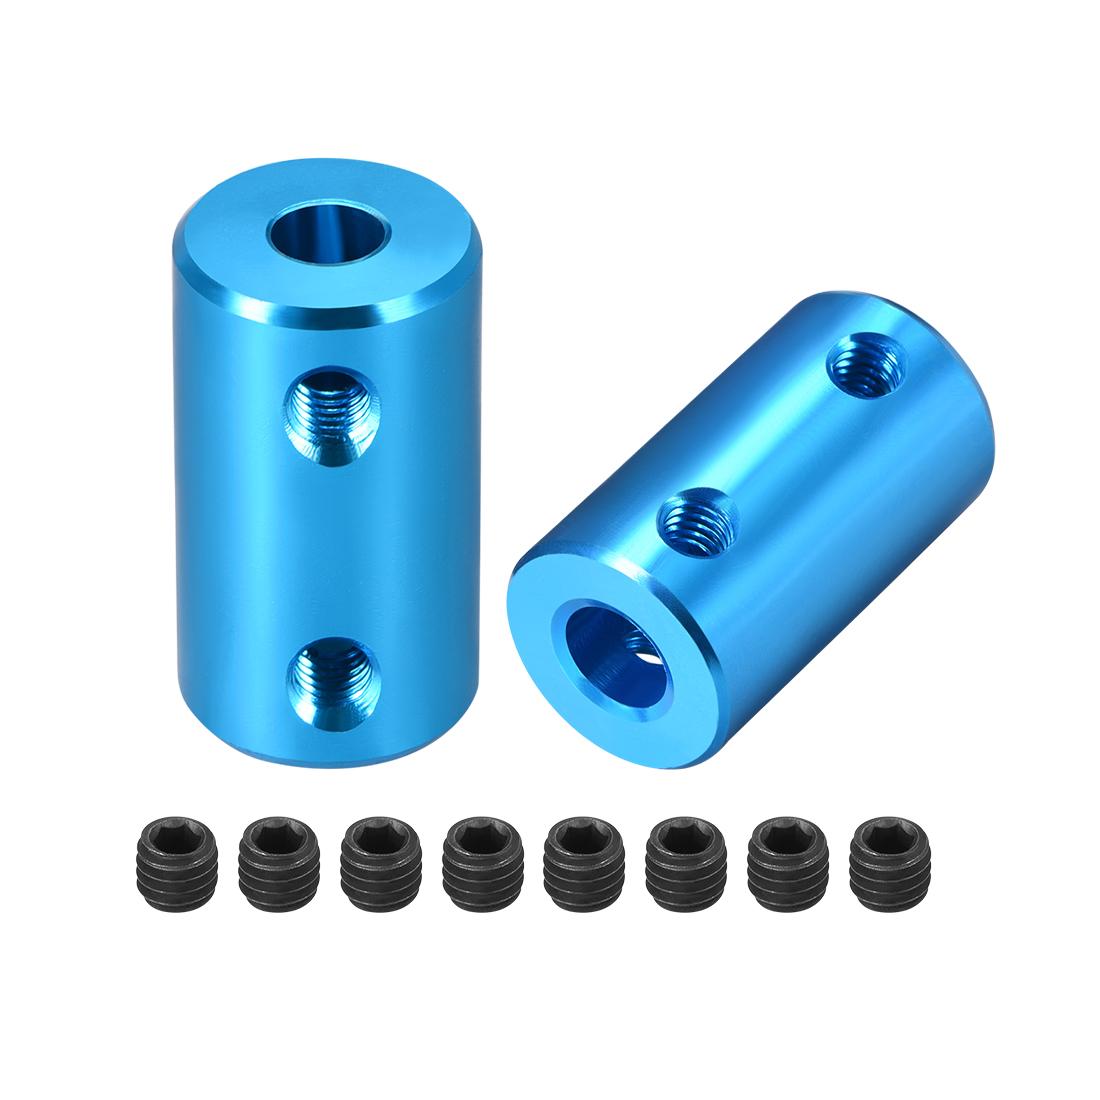 Shaft Coupling 5mm to 6mm Bore L25xD14 Robot Motor Wheel Rigid Coupler Blue 2pcs